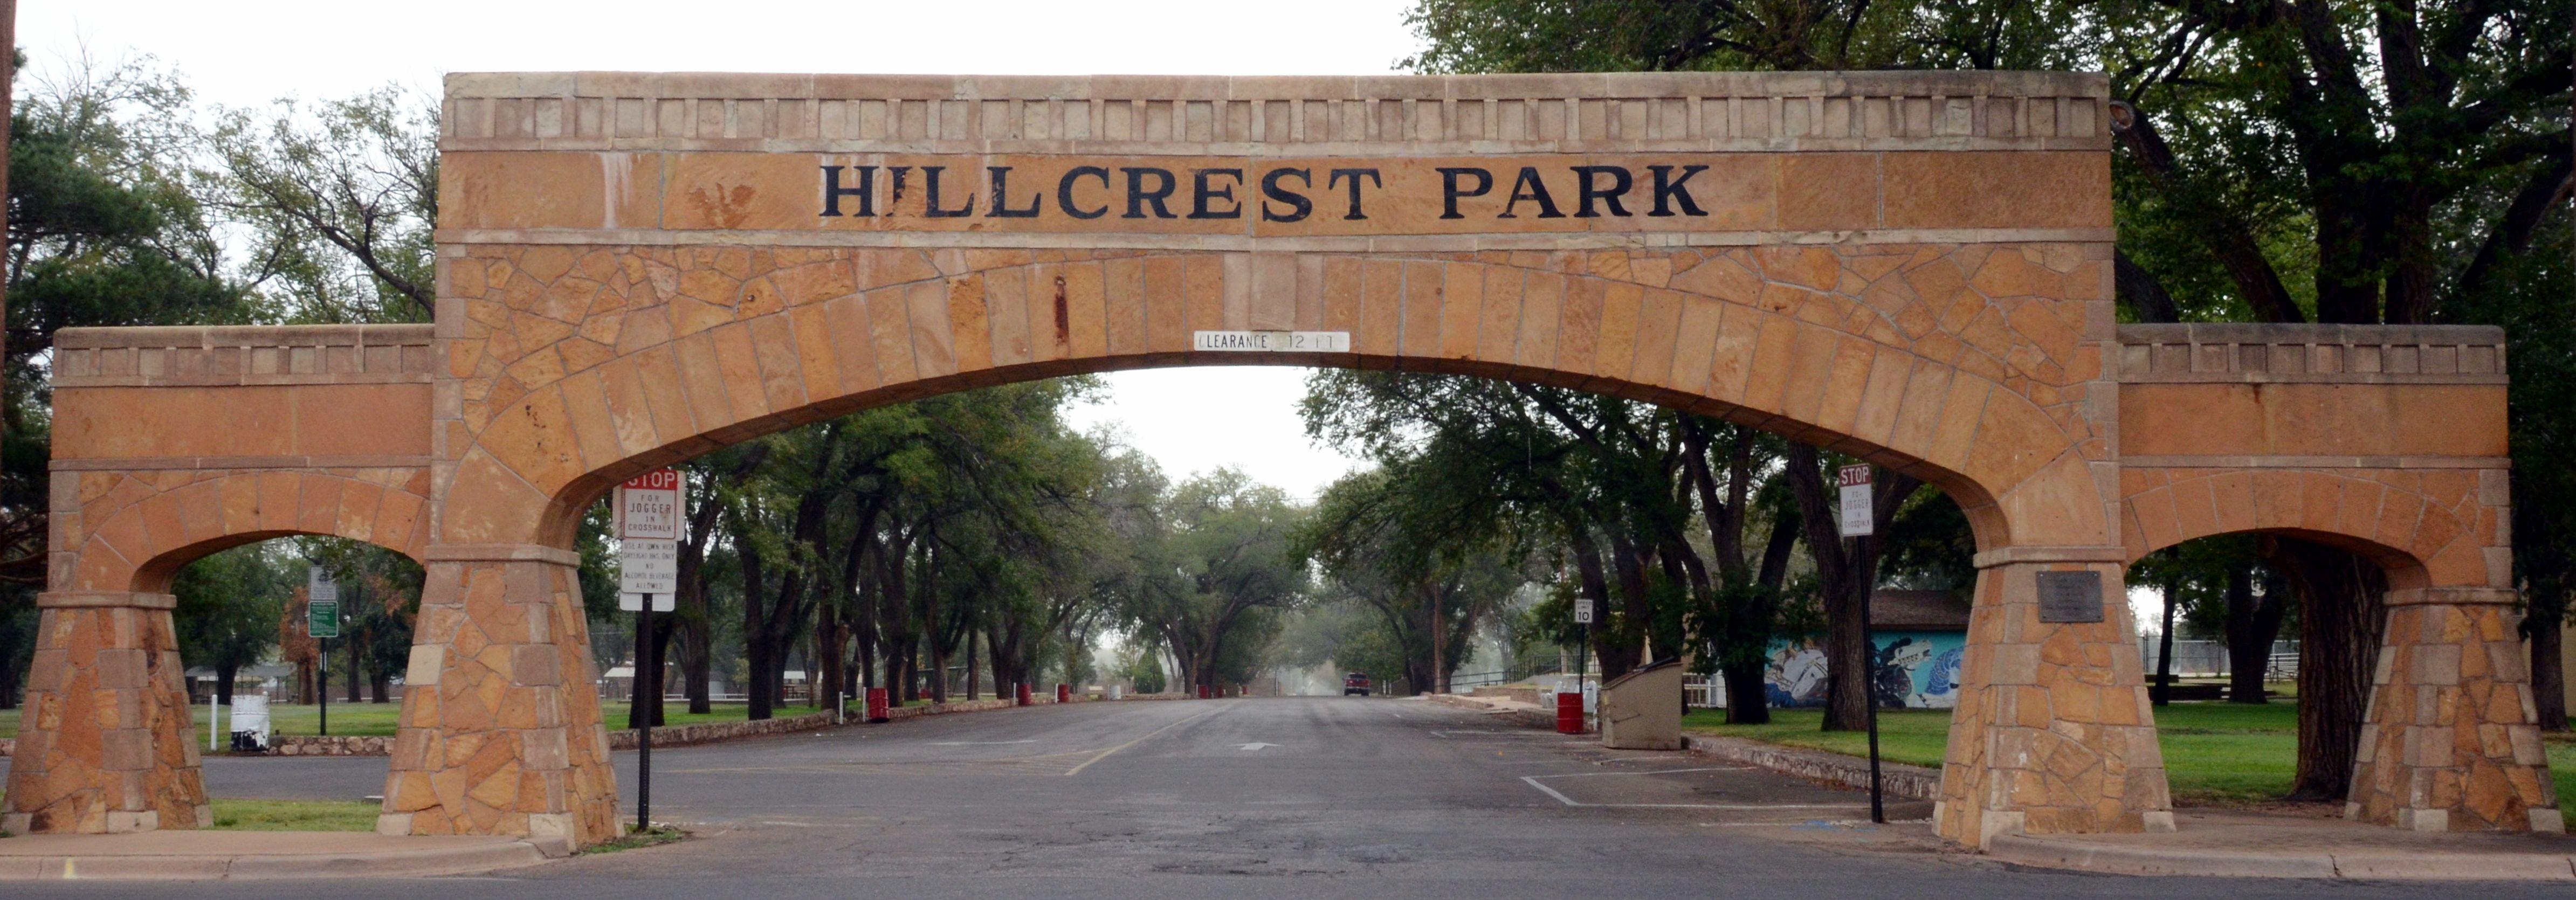 New mexico curry county clovis - Hillcrest Park Clovis Nm Google Search